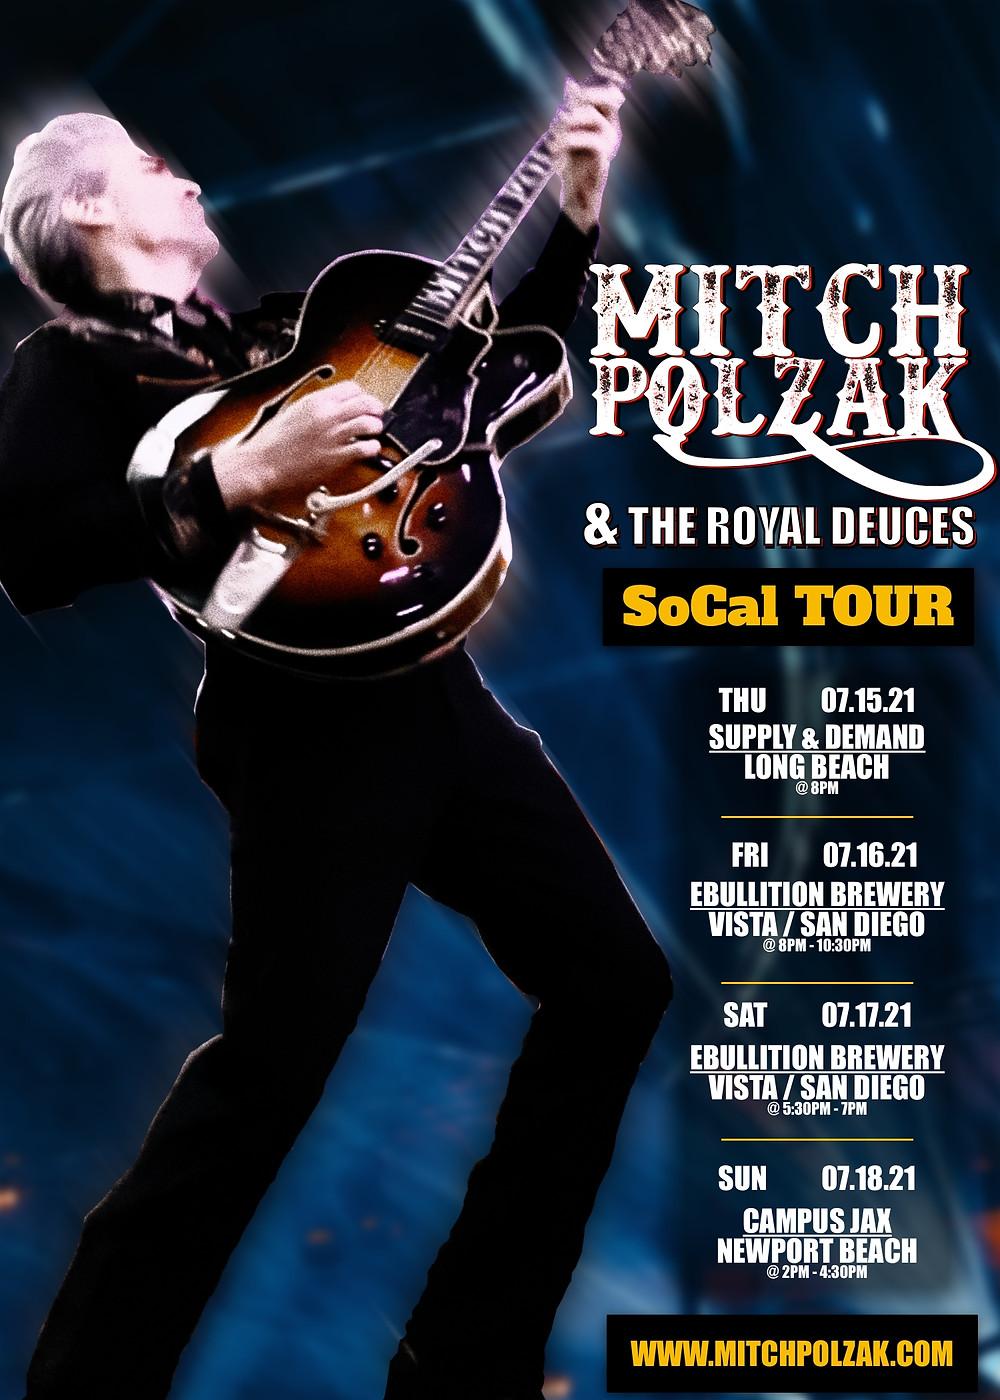 Mitch Polzak & The Royal Deuces SoCal Tour